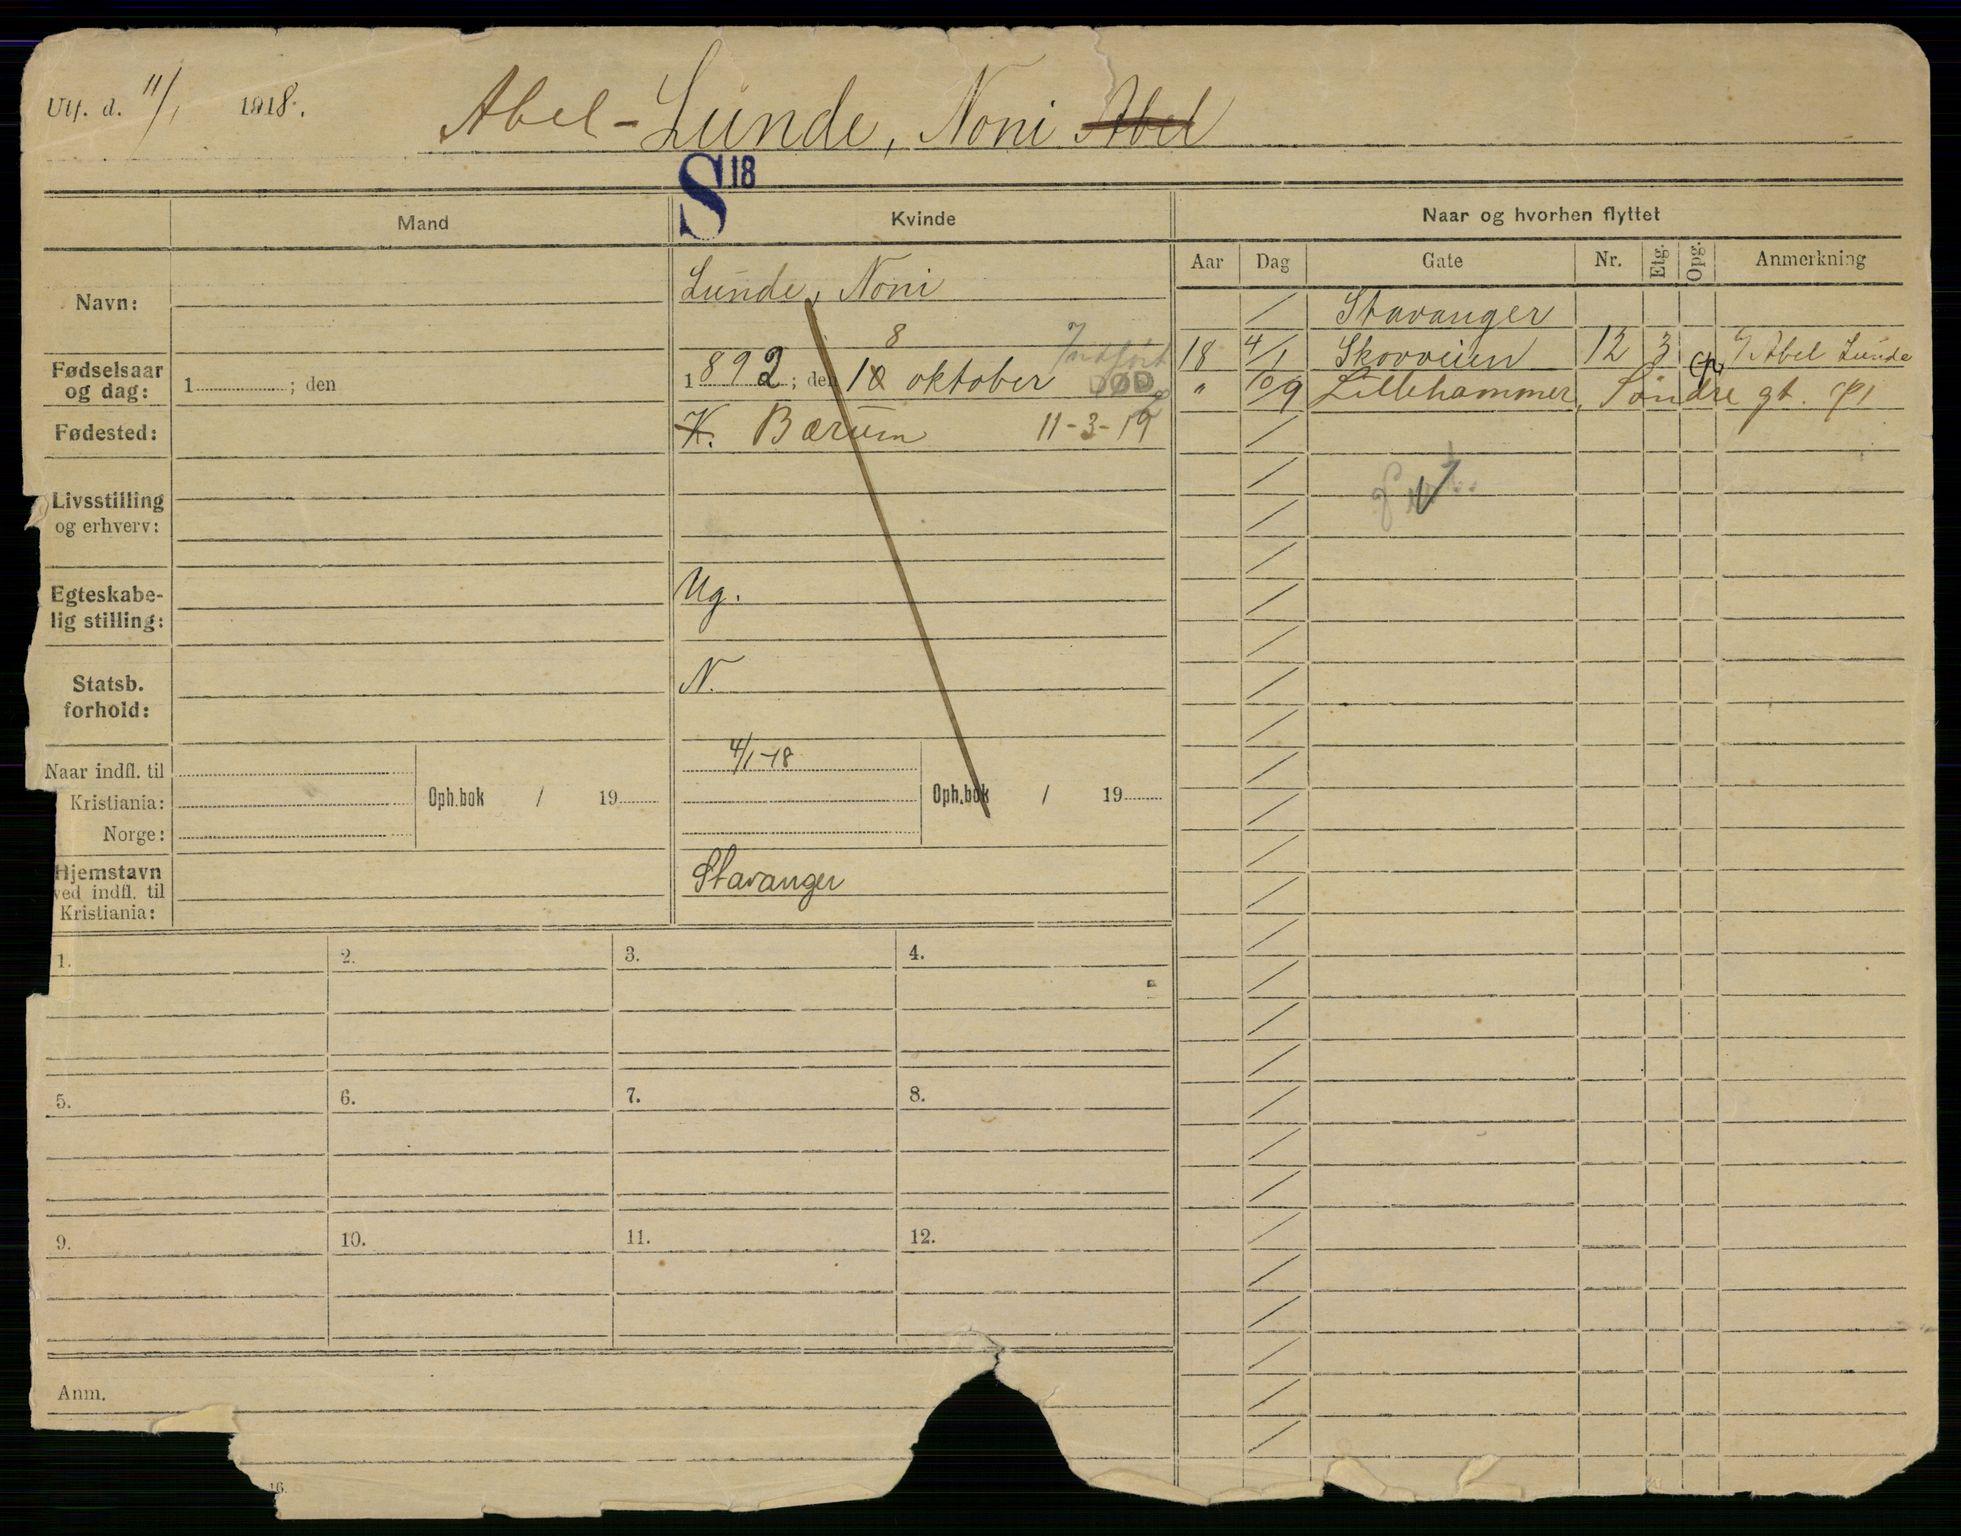 SAO, Oslo folkeregister, Registerkort, G/Gb/L0029: Kvinner, 1919